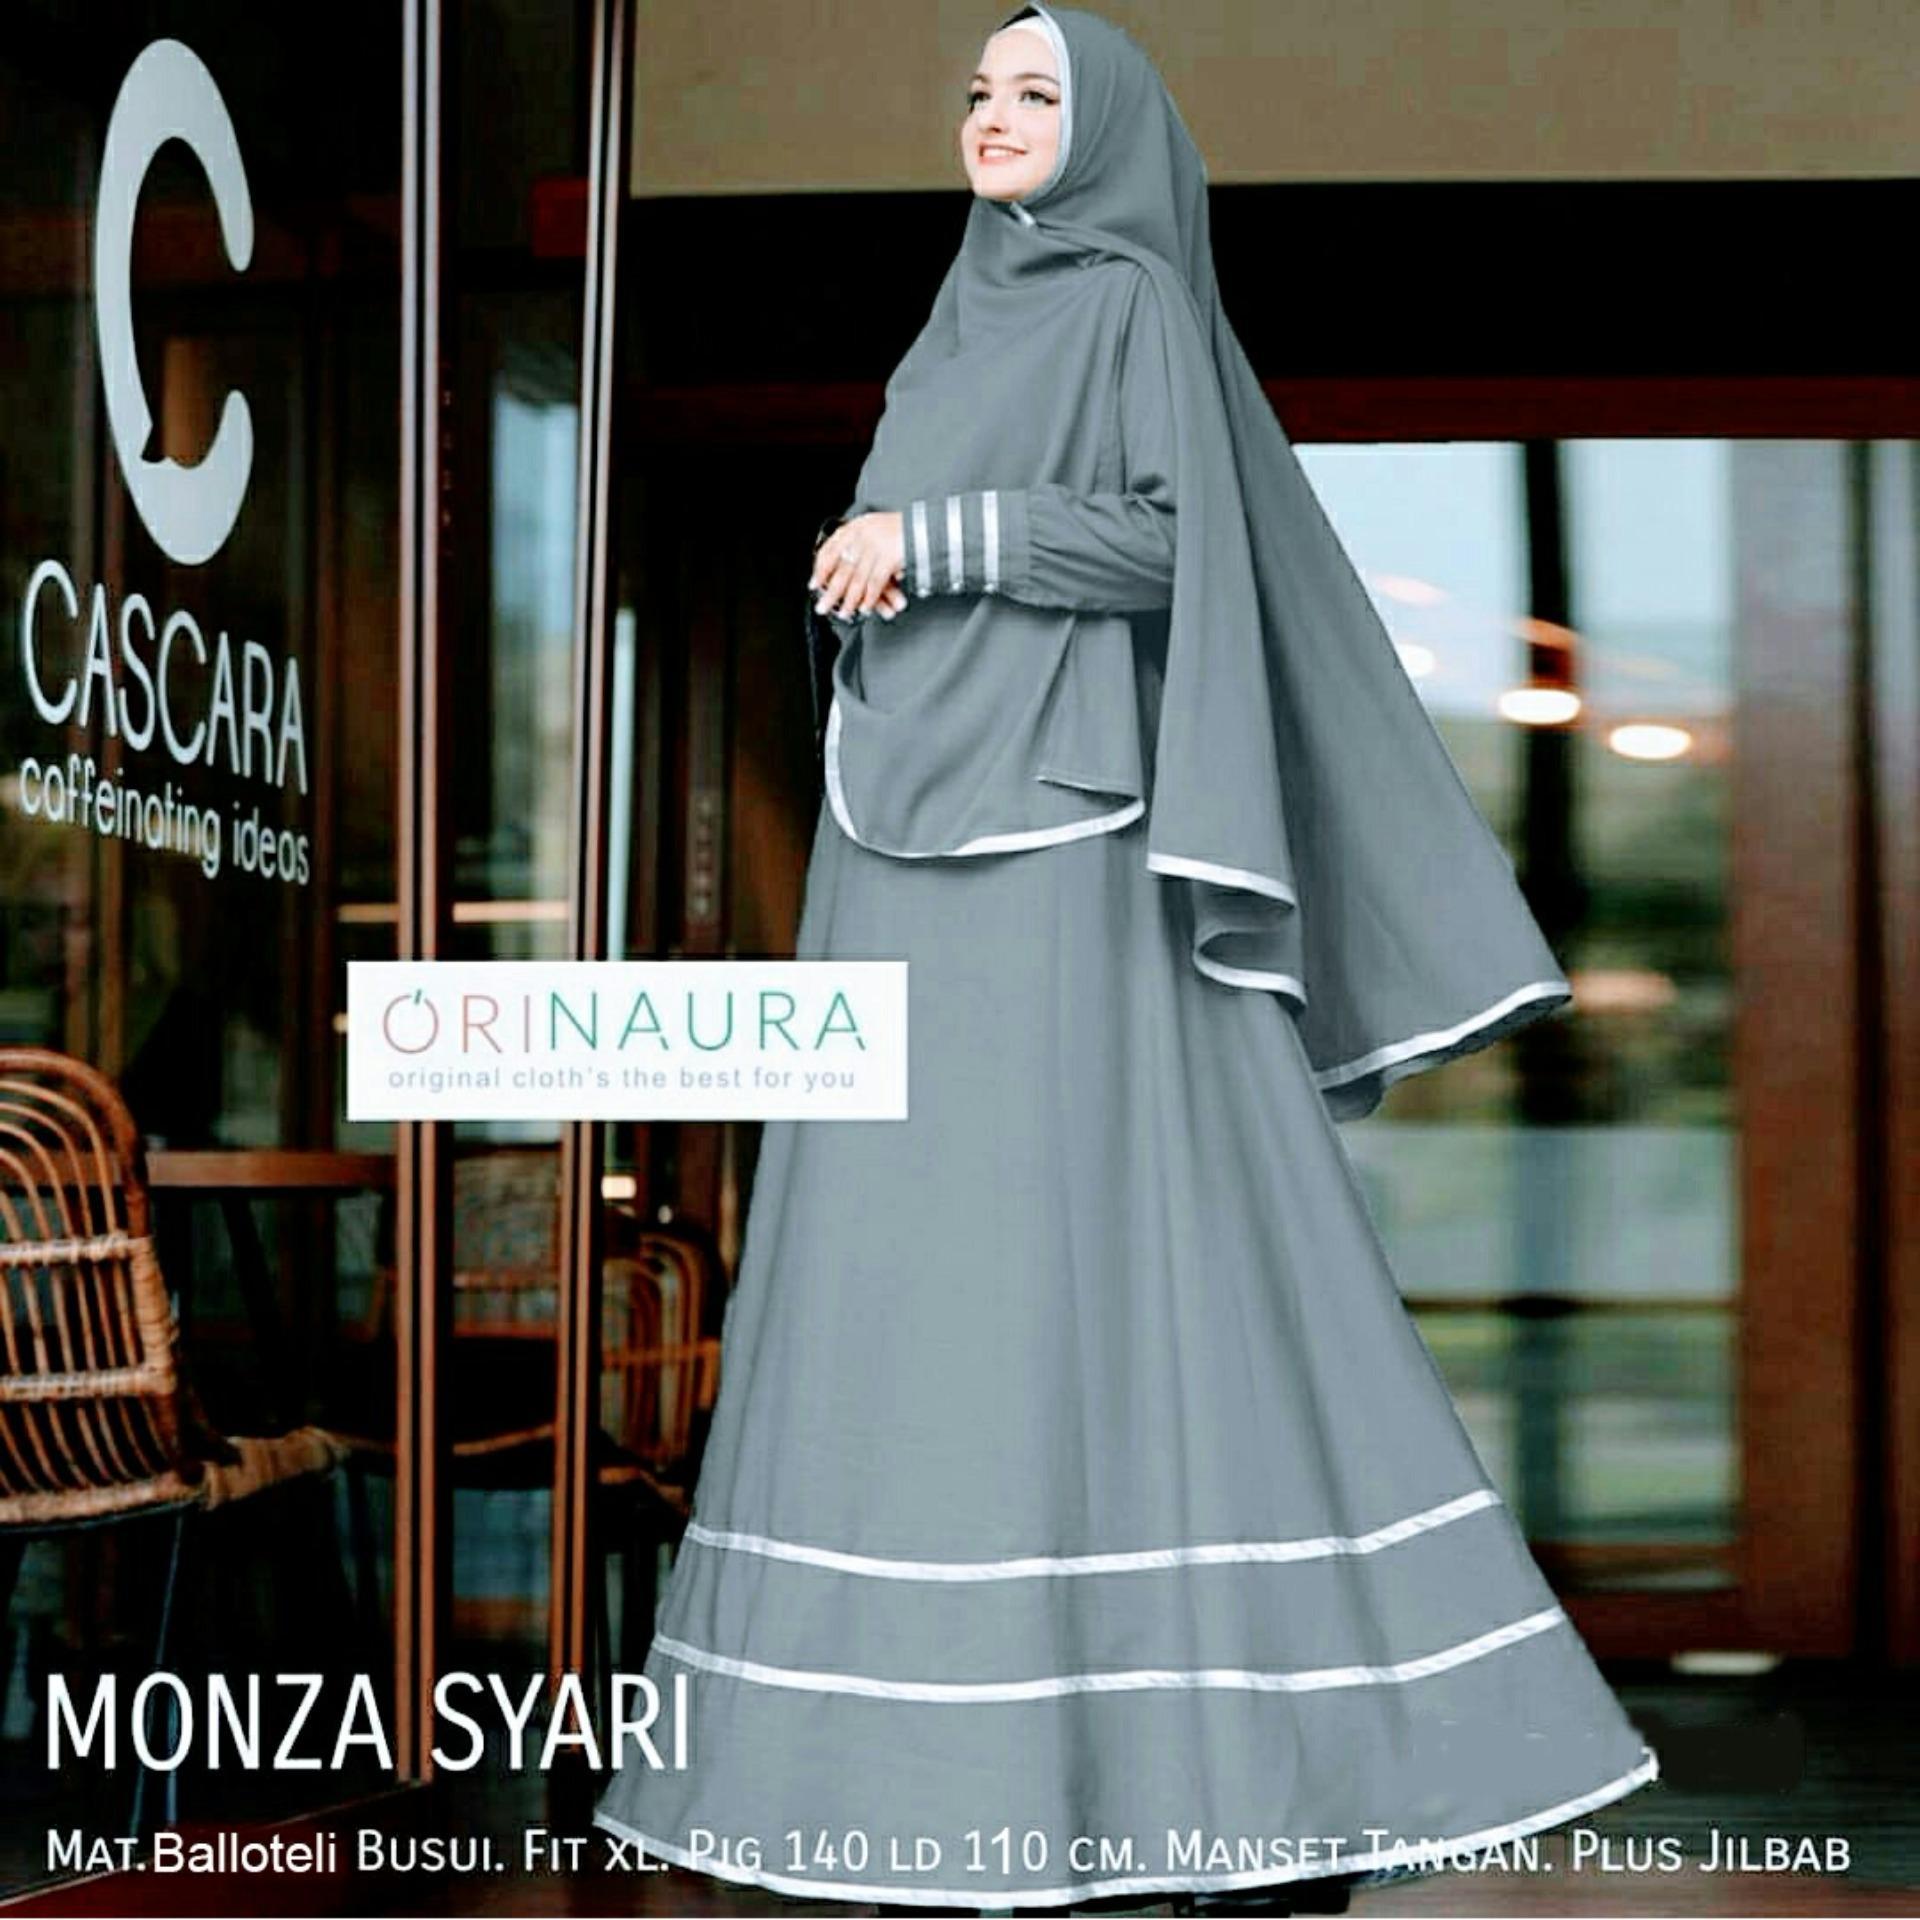 Penawaran Gamis Putih Cantik Umroh Long Dress White Muslimah Xl